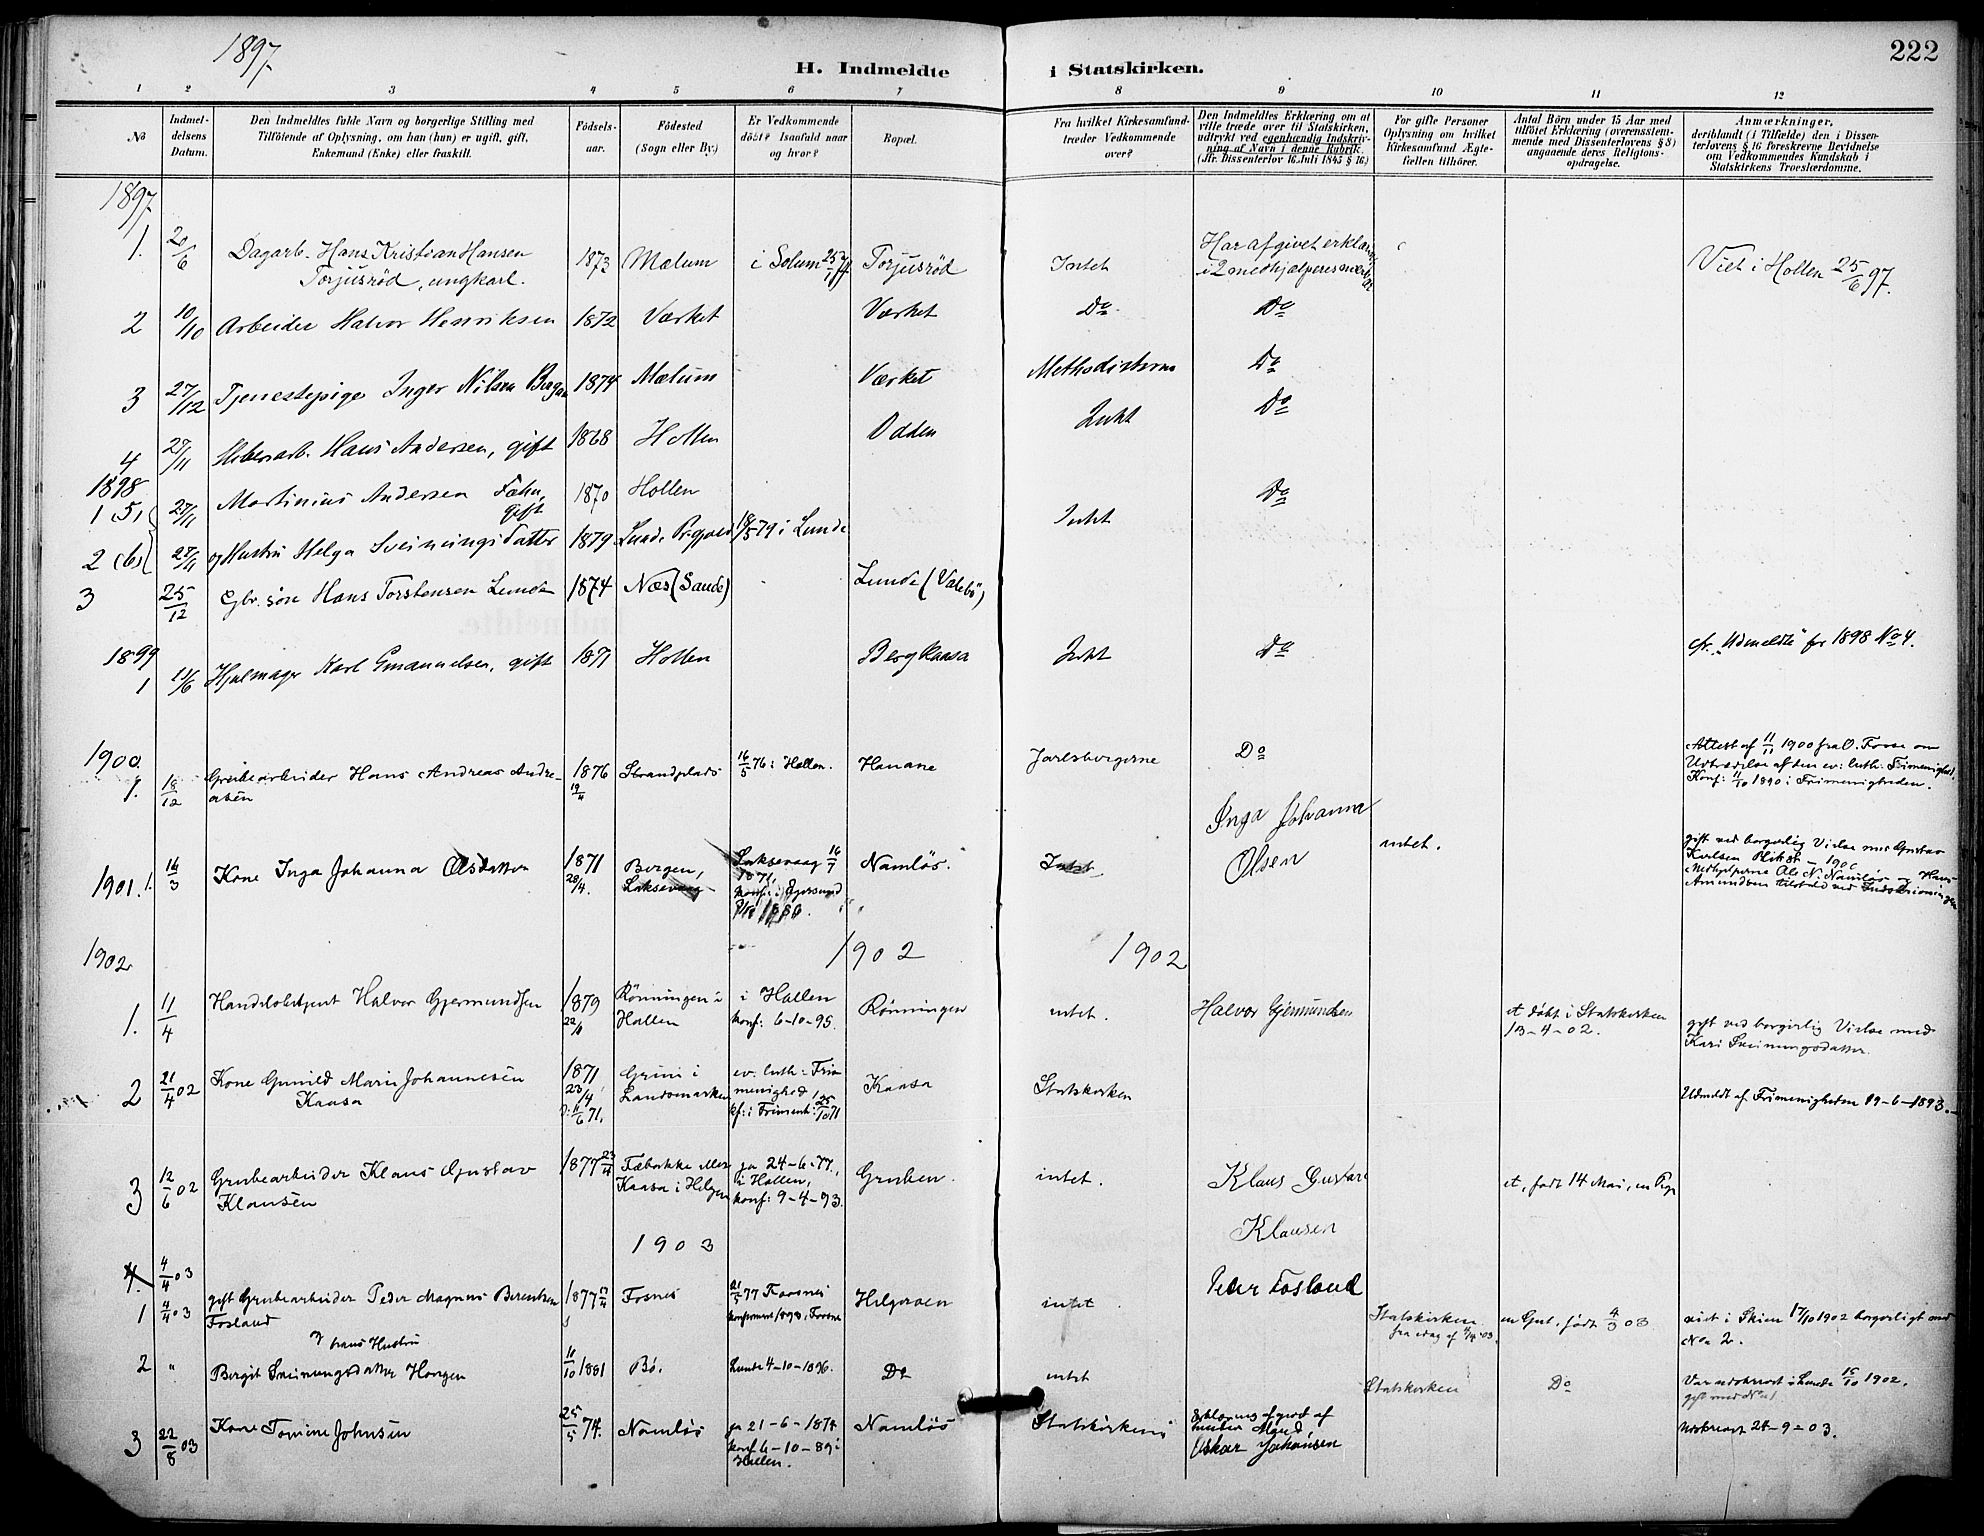 SAKO, Holla kirkebøker, F/Fa/L0010: Ministerialbok nr. 10, 1897-1907, s. 222